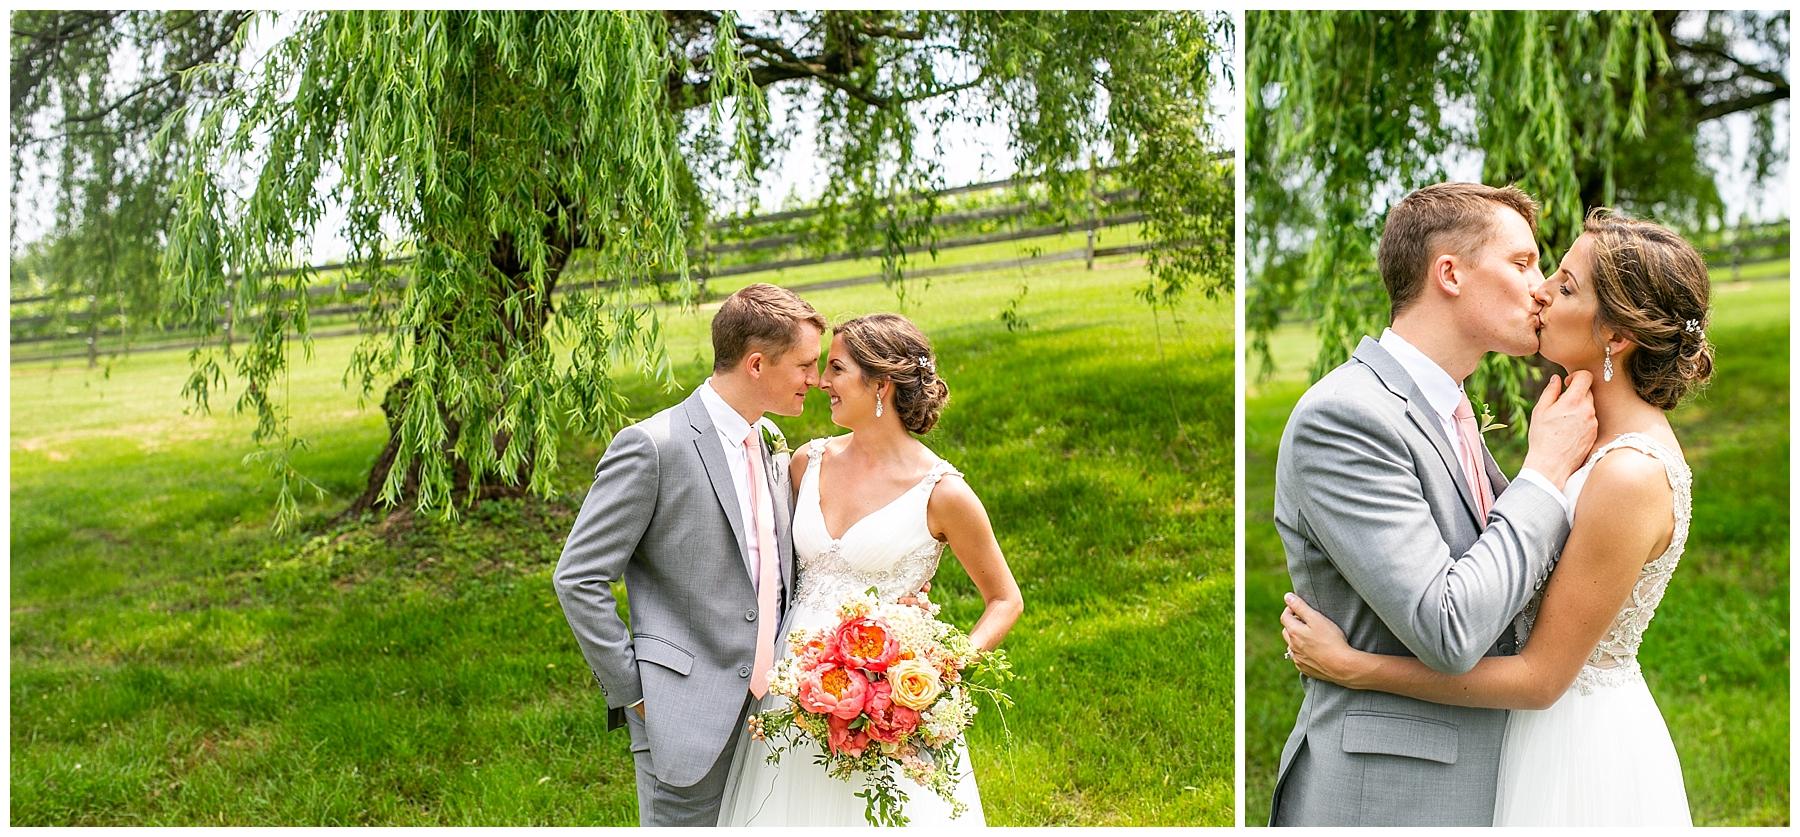 Chelsea Phil Bohemia River Overlook Wedding Living Radiant Photography photos_0056.jpg